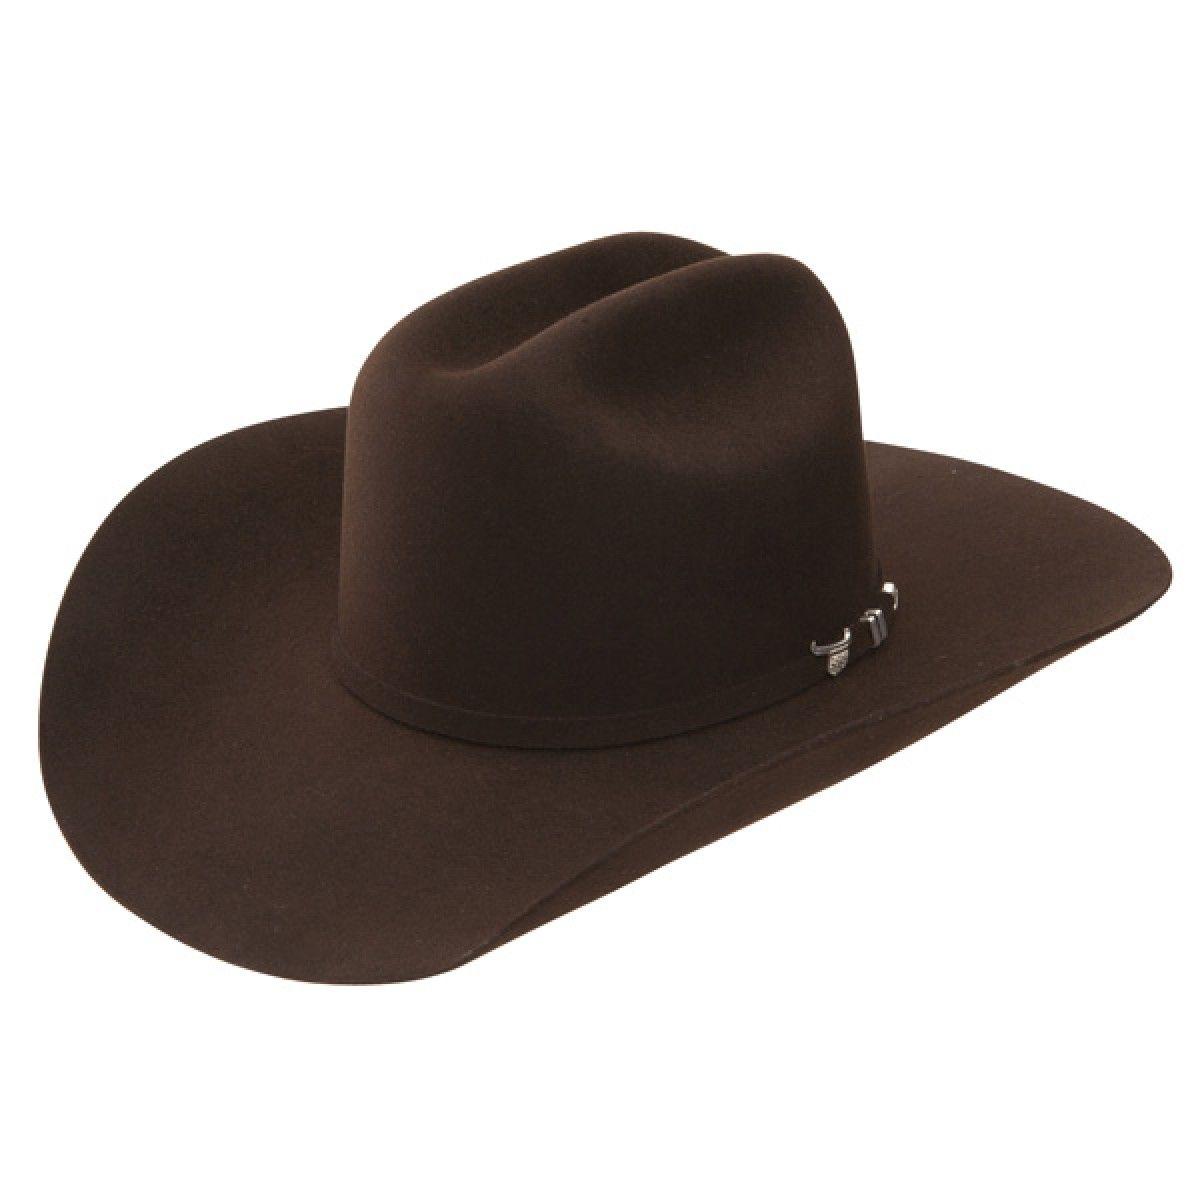 98ebb1908c6 USTRC - (6X) Fur Cowboy Hat  258.98